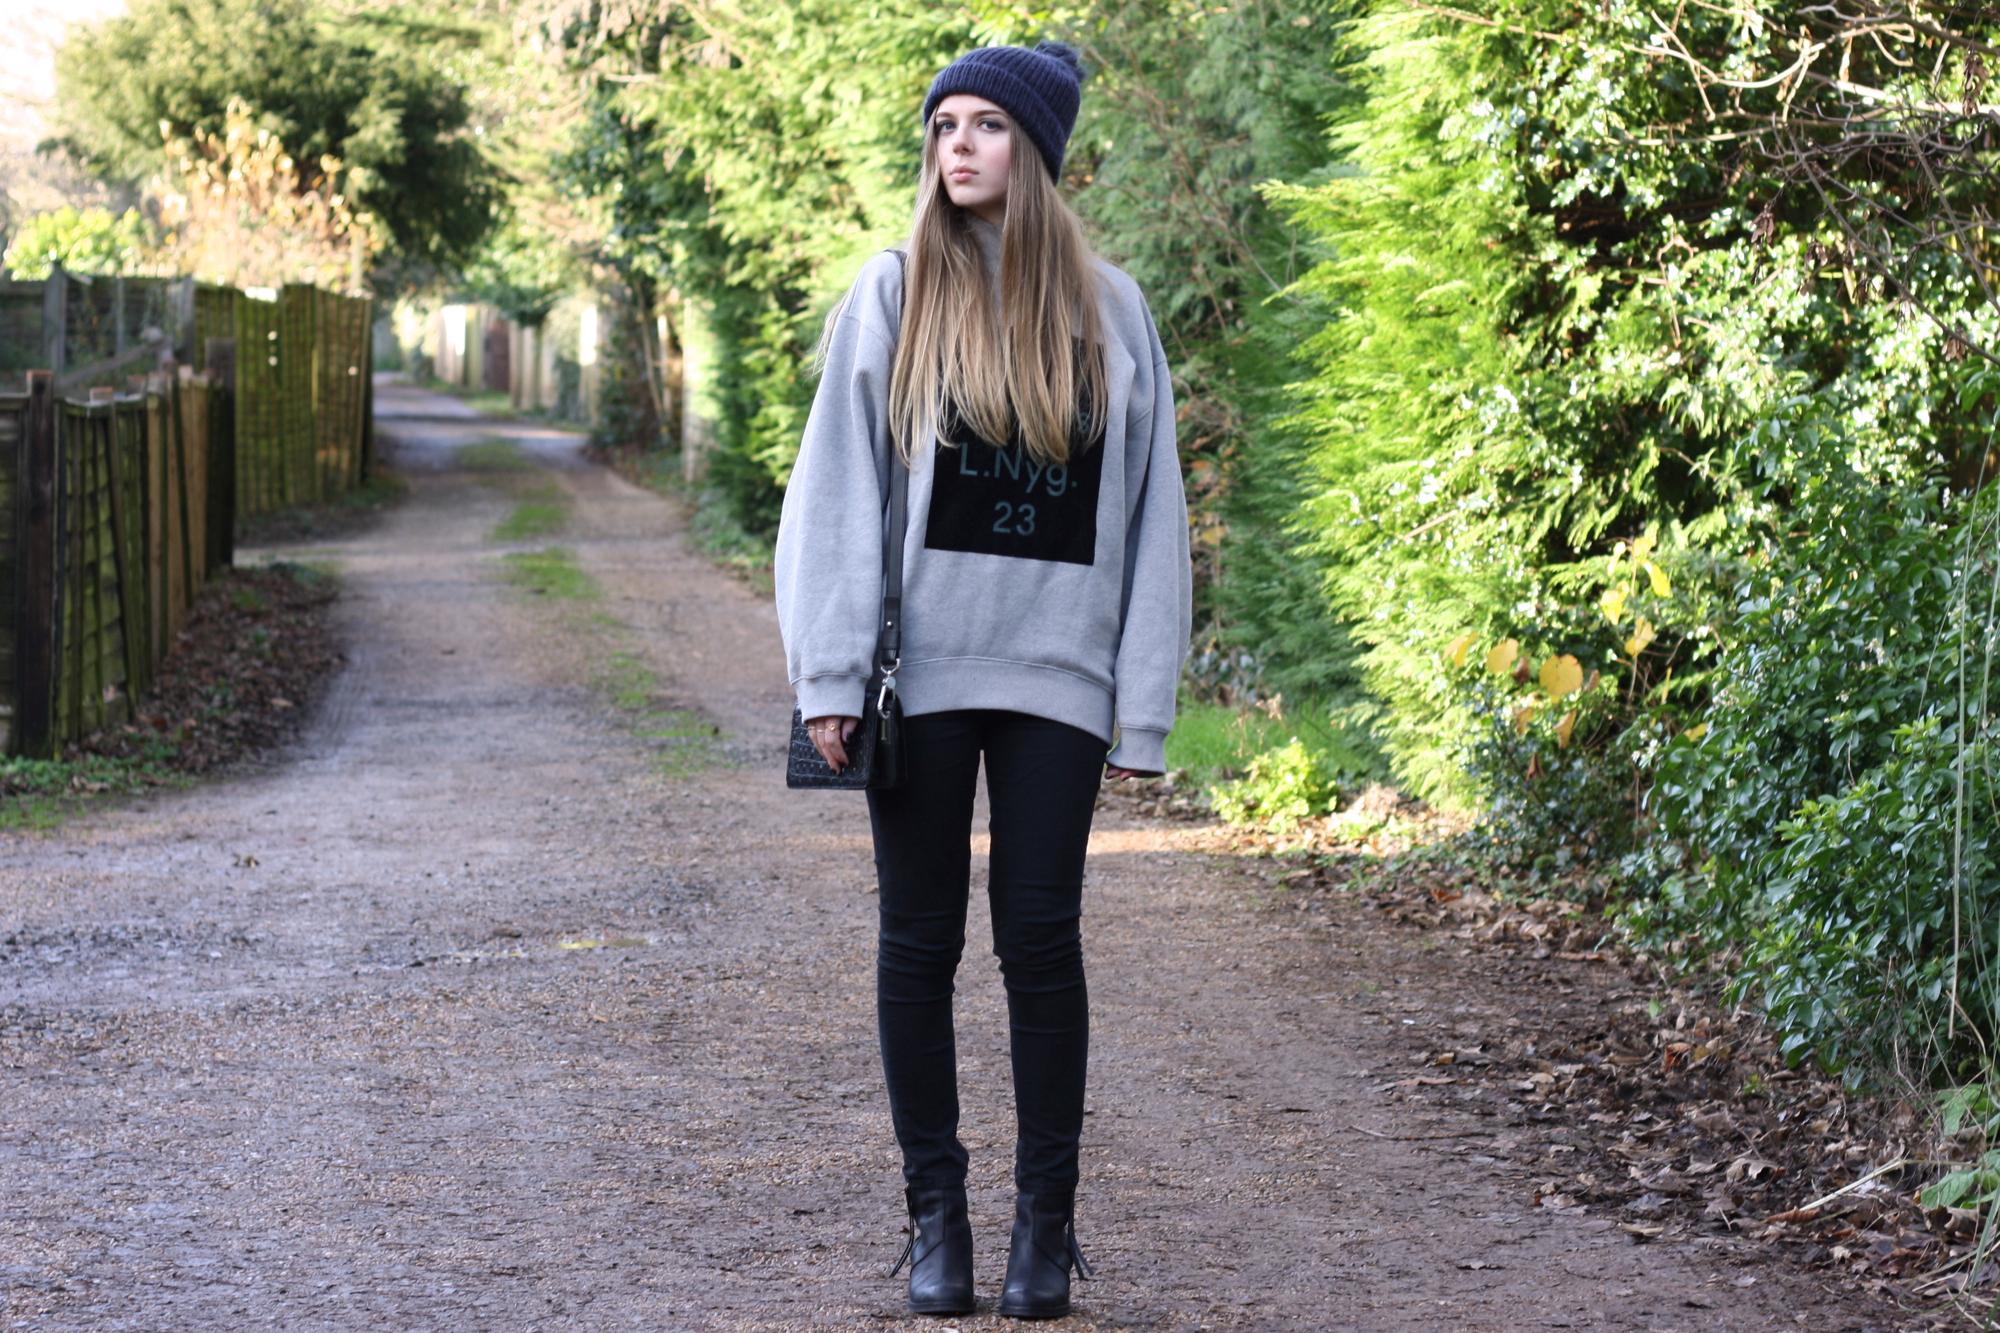 Acne Studios Beta flock sweatshirt